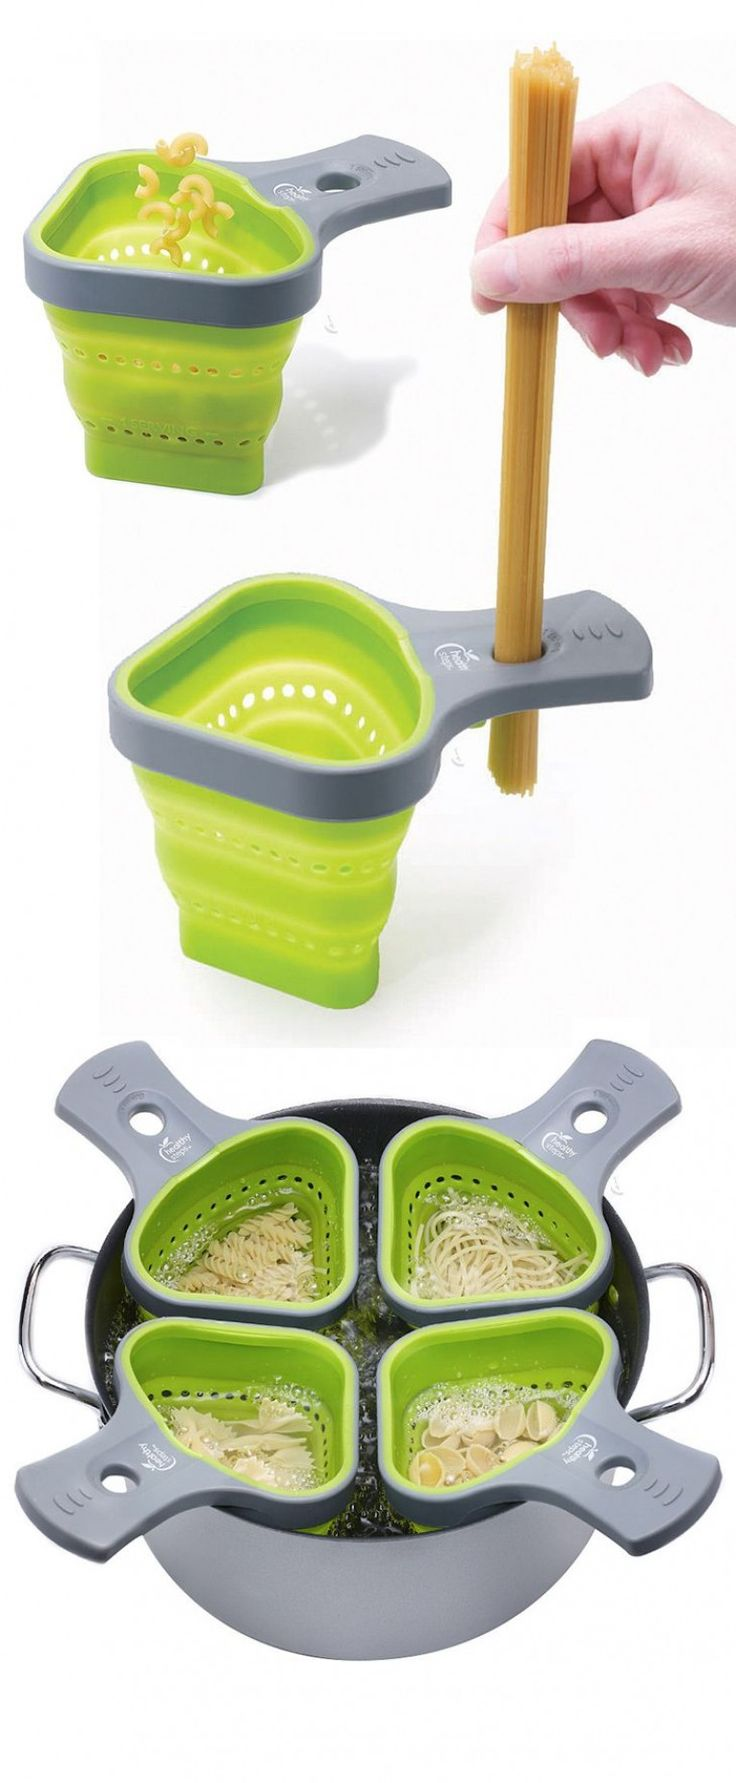 Healthy Steps Portion Control Pasta Basket : thegadgetisland